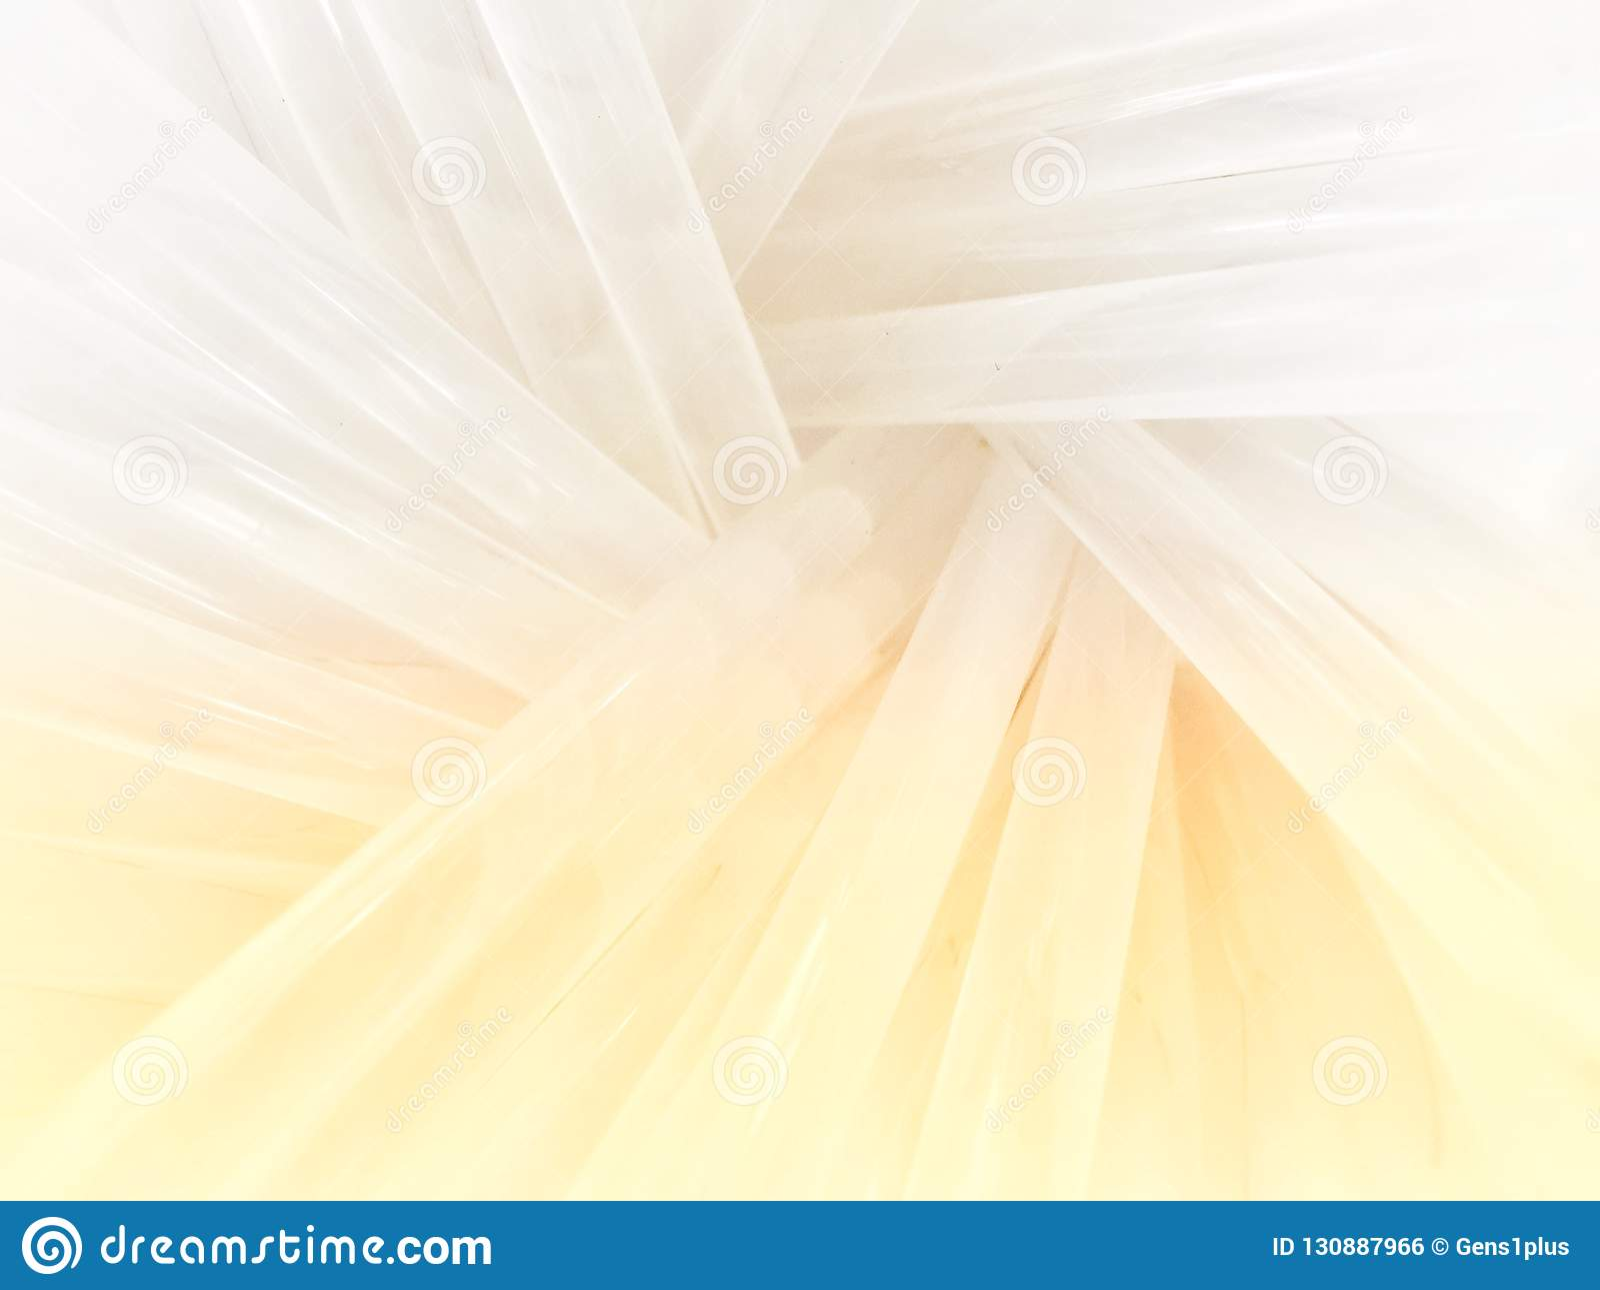 Glue Silicone Sticks Background, White,abstract  Stock Photo